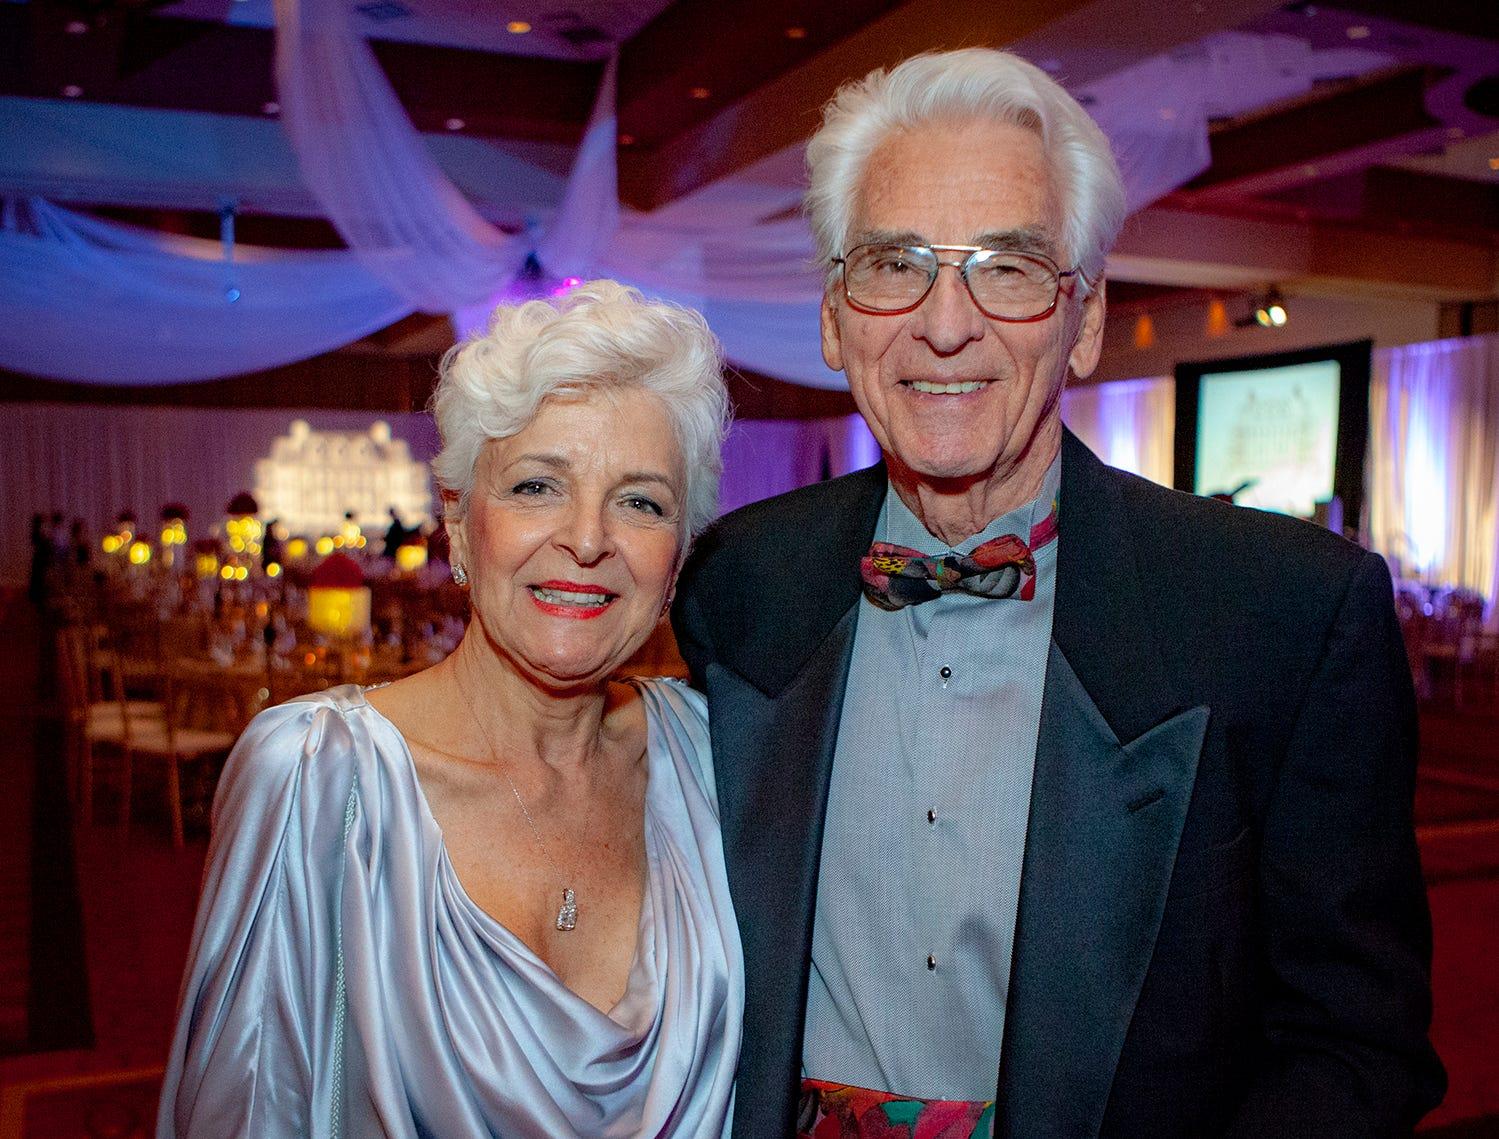 Jackie and Jay Archerat the 2019 Saint Thomas Rutherford Foundation Gala on Saturday, Jan. 19, 2019 at Embassy Suites Murfreesboro.